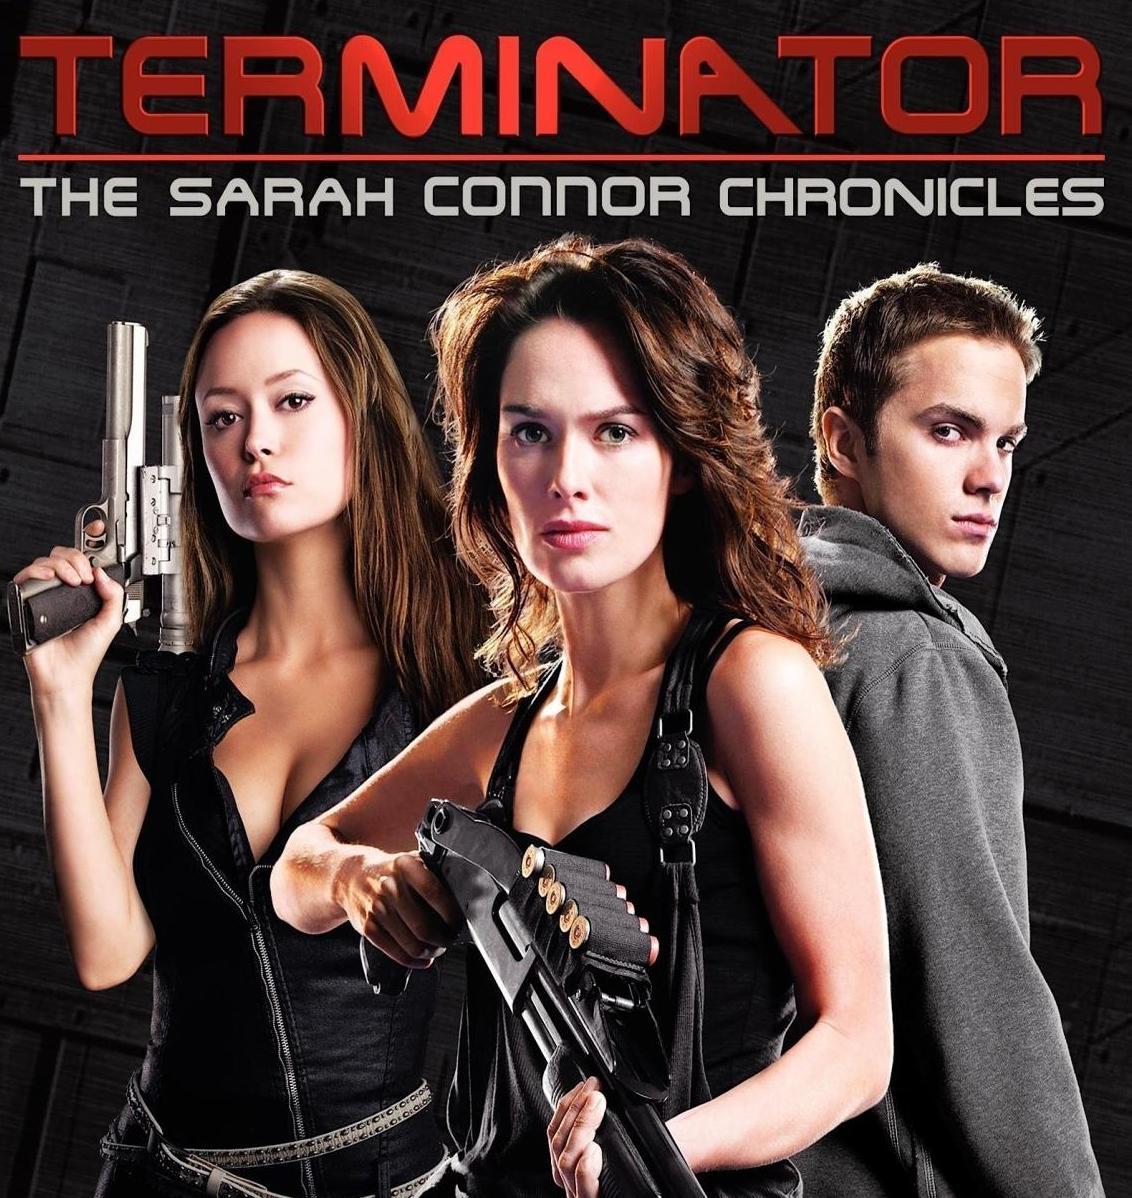 http://3.bp.blogspot.com/_Fv90J7eTcis/TCClnTRvavI/AAAAAAAAFZQ/SRwj0UuRieM/s1600/Terminator+The+Sarah+Connor+Chronicles.jpg